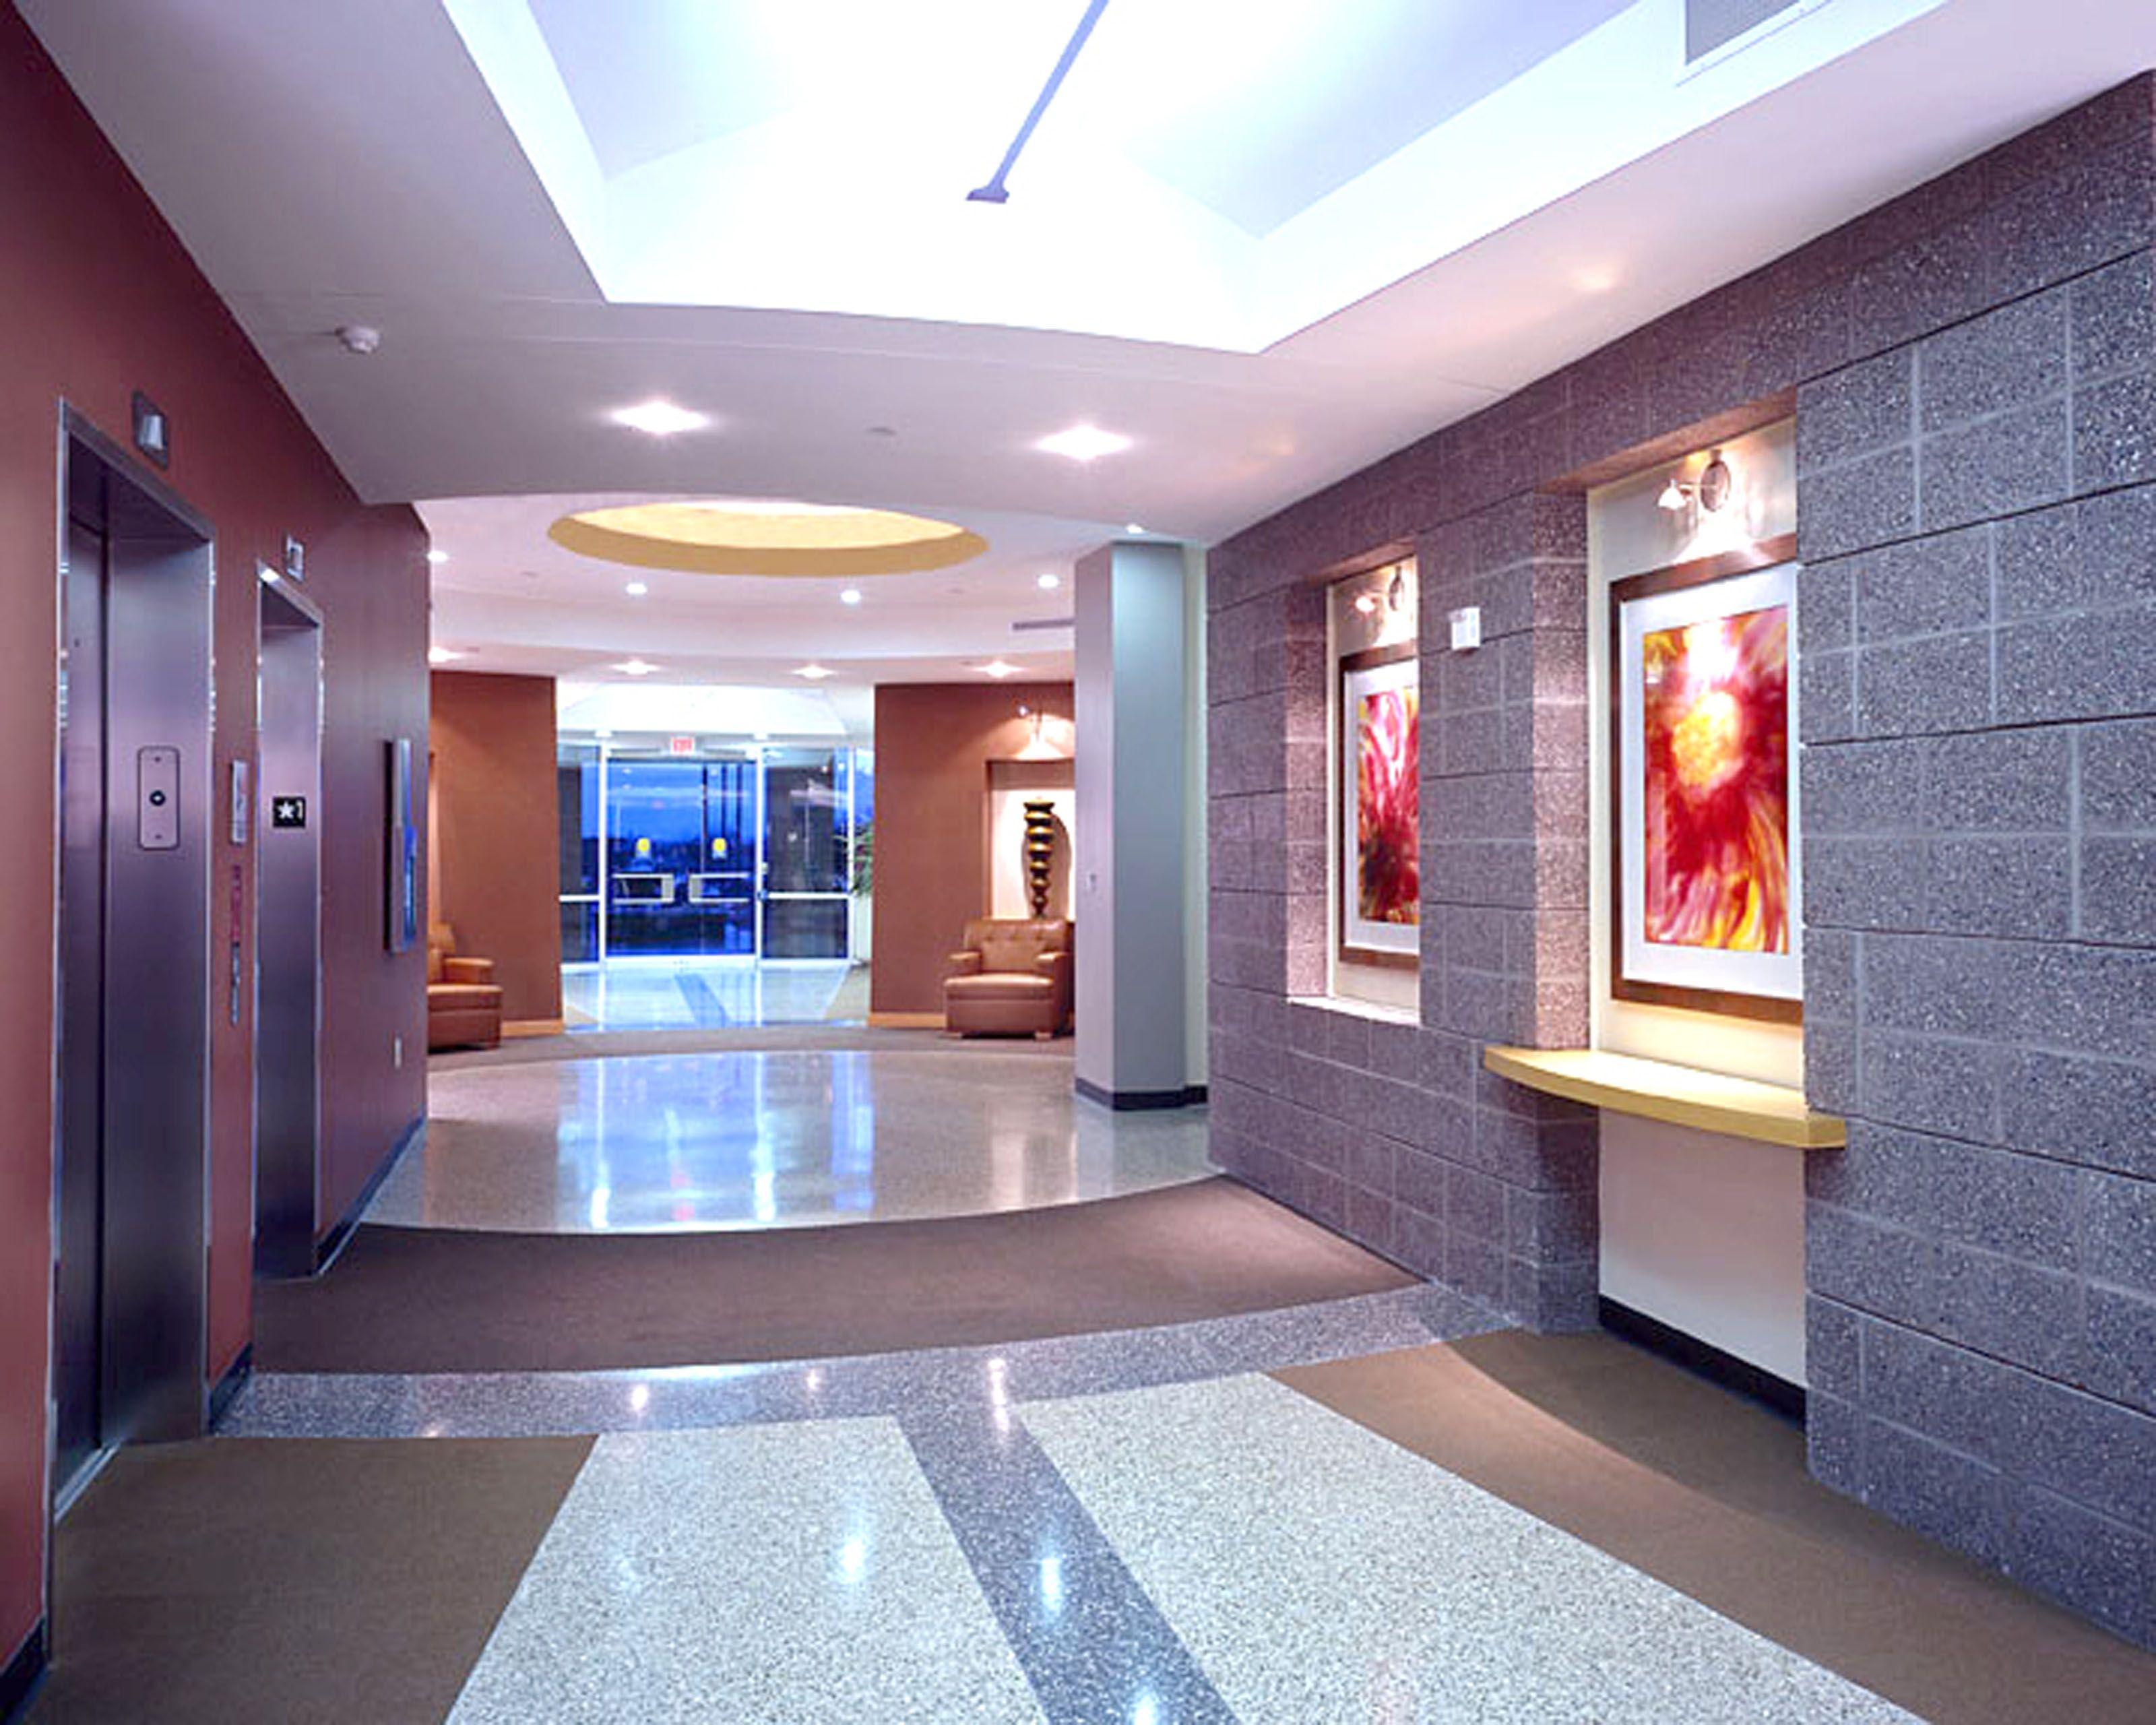 Medical office interior design pictures banner estrella - Office building interior design ideas ...